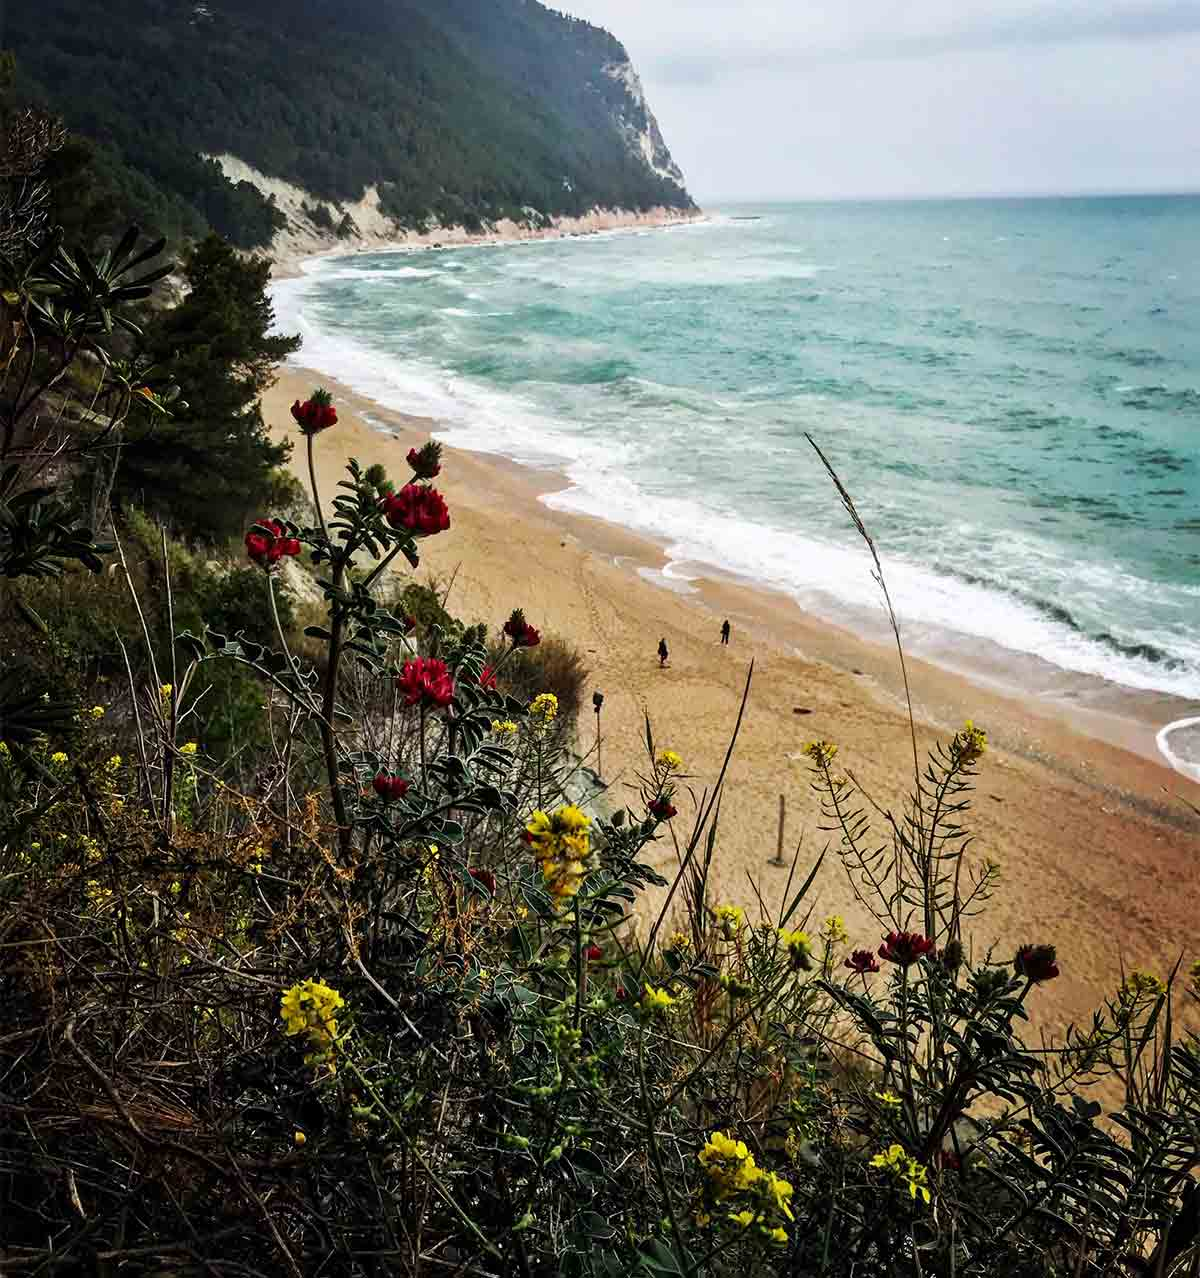 Sirolo, Spiaggia San Michele - foto by Nicolò Brandoni